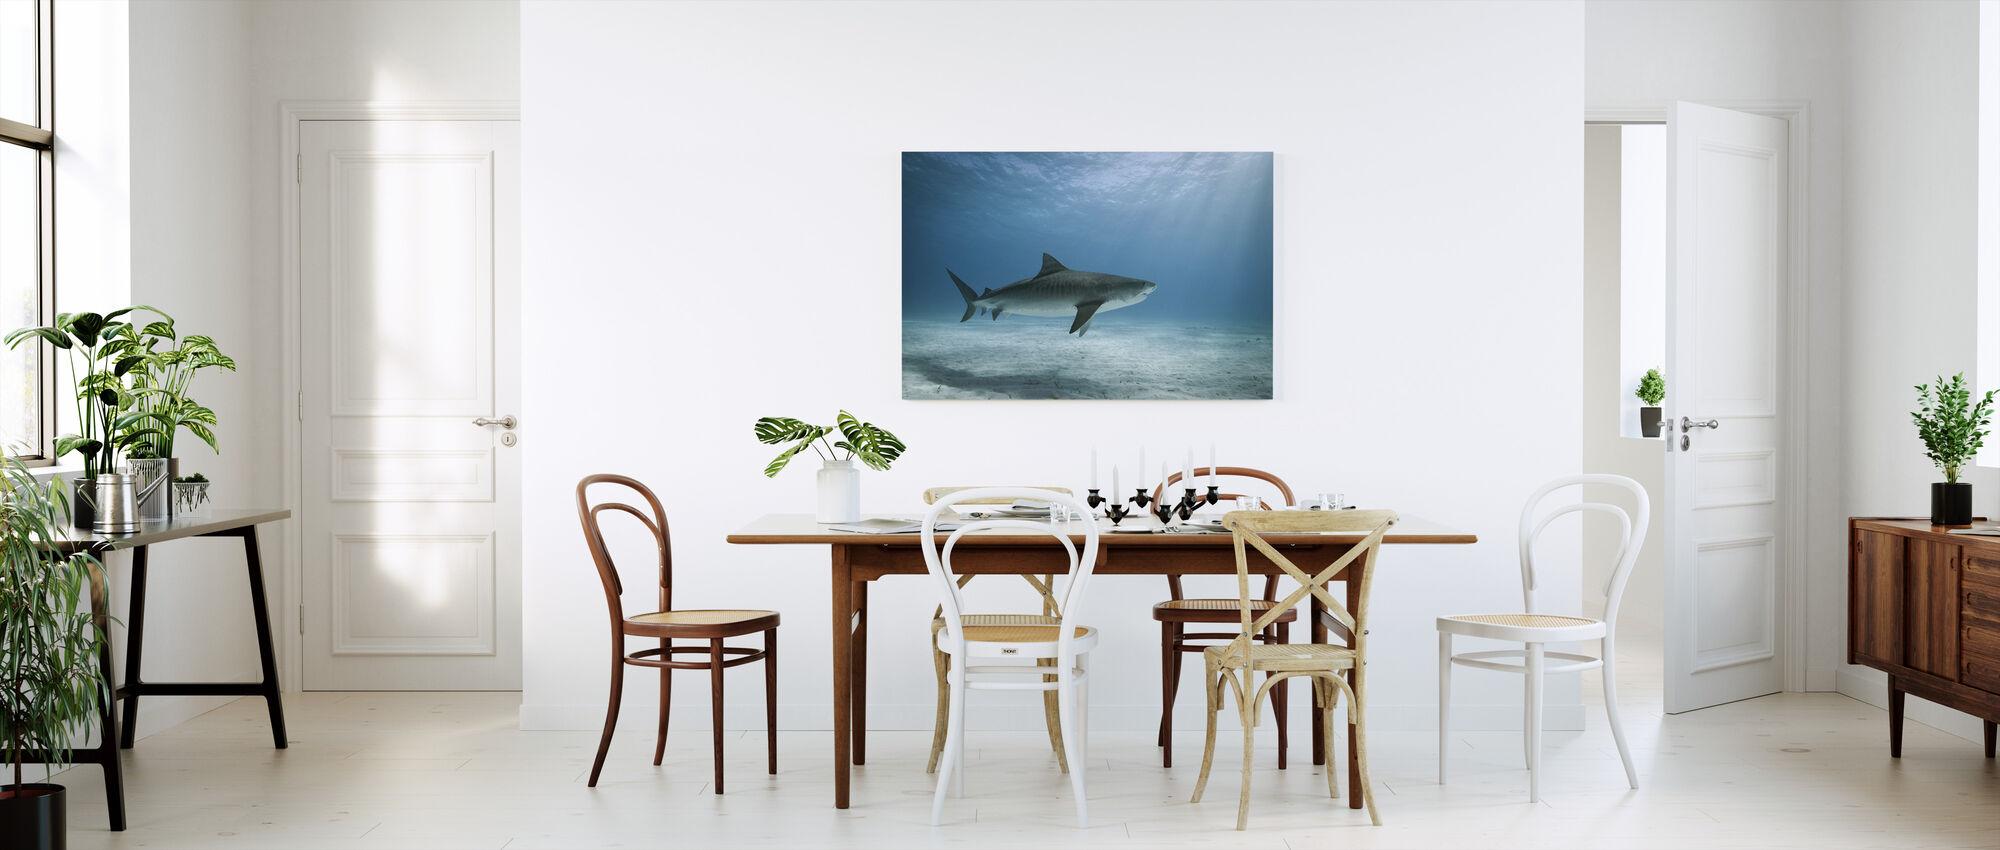 Tijgerhaai - Canvas print - Keuken